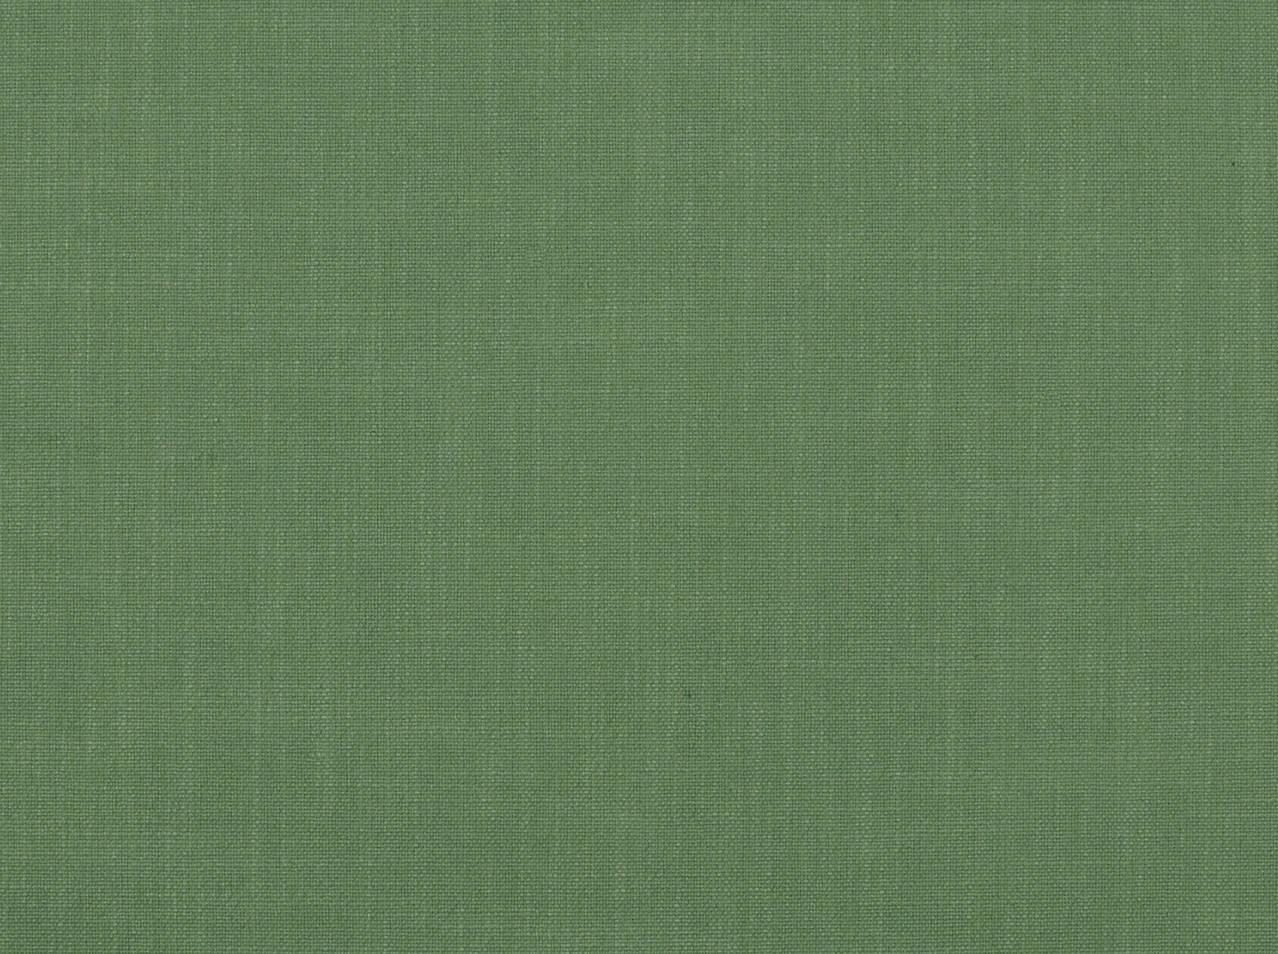 Hp bristol 27 Celadon